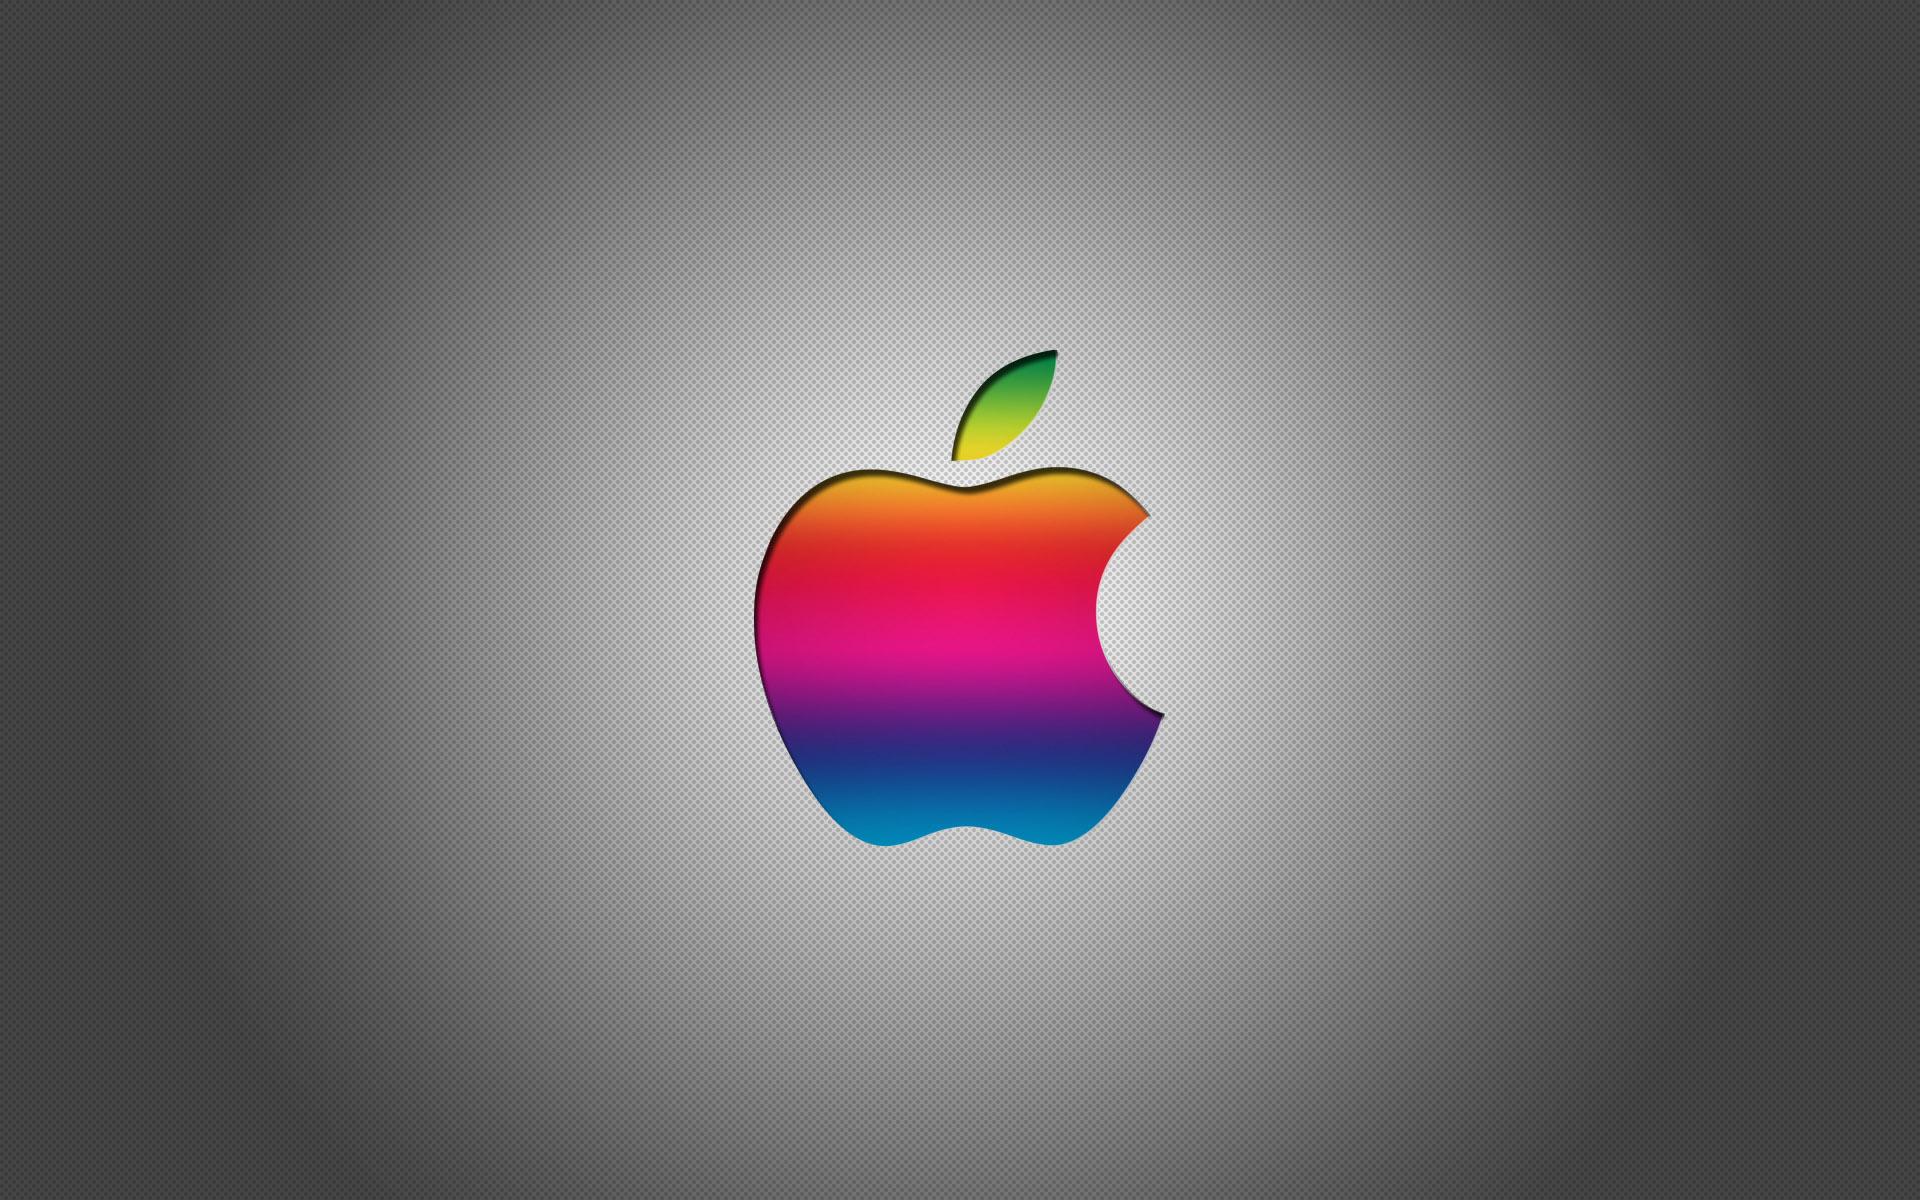 Cool Apple Backgrounds Mac 1920x1200